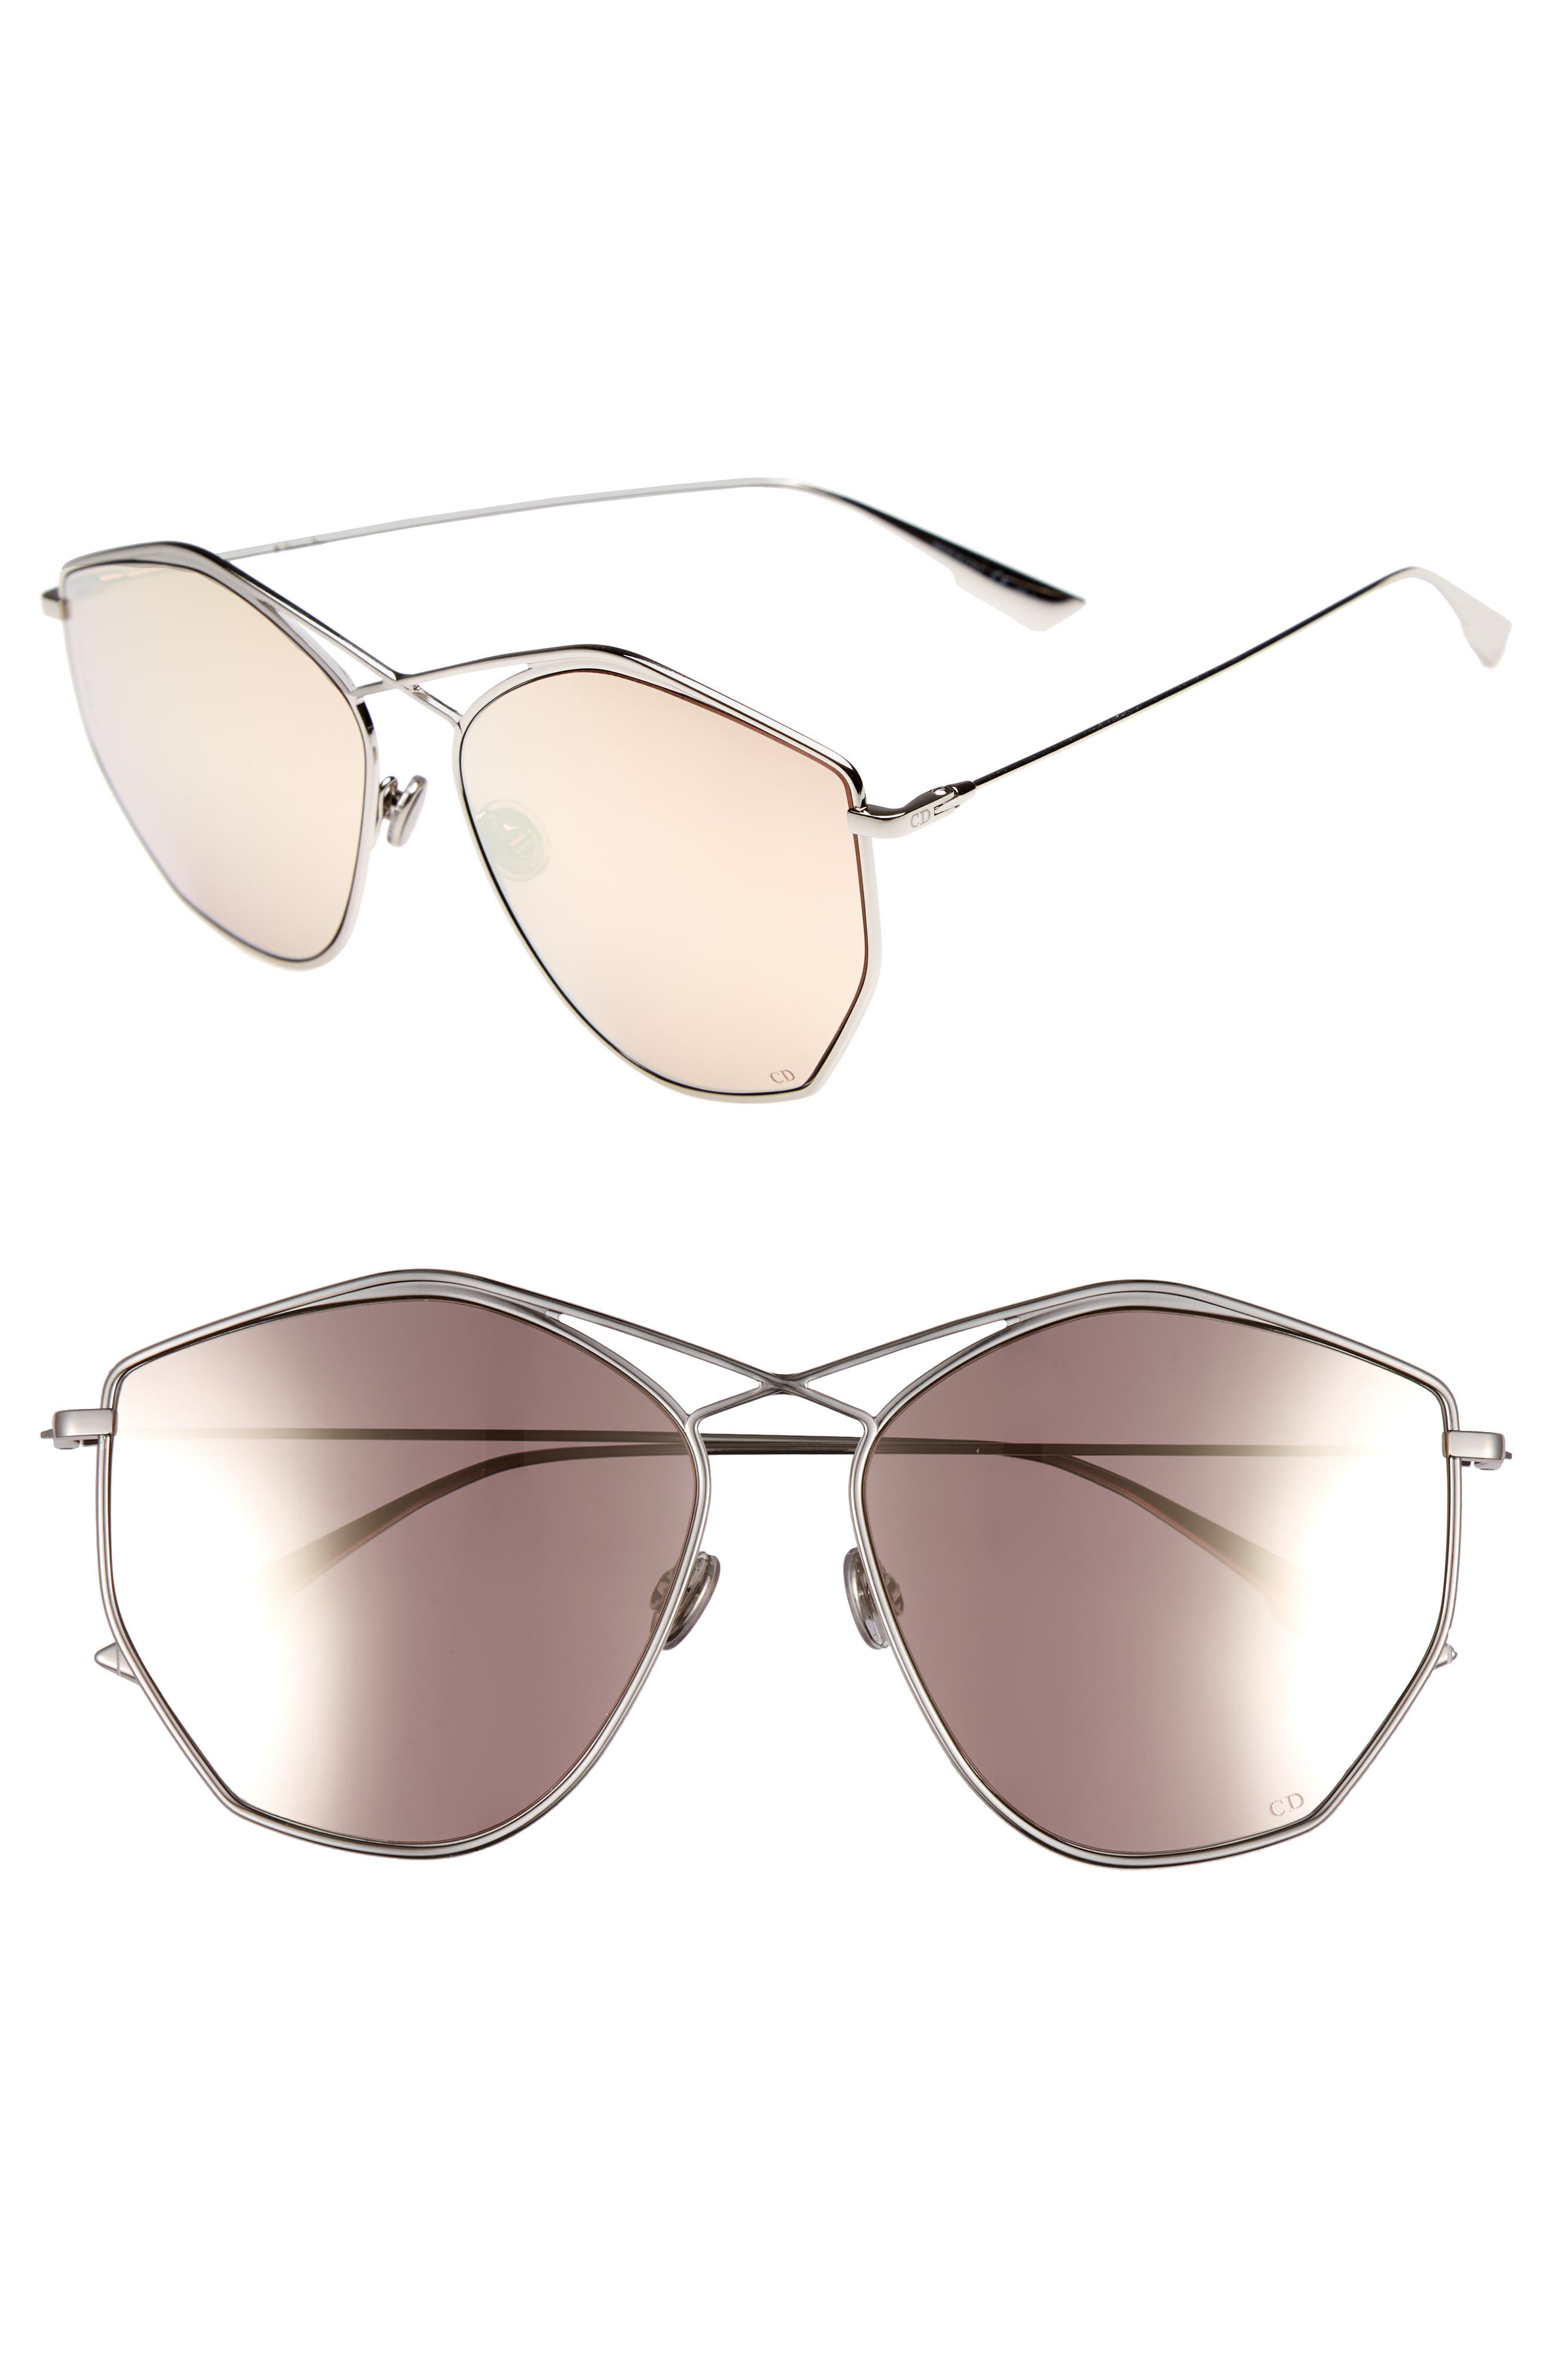 59mm Metal Sunglasses,                         Main,                         color, Palladium